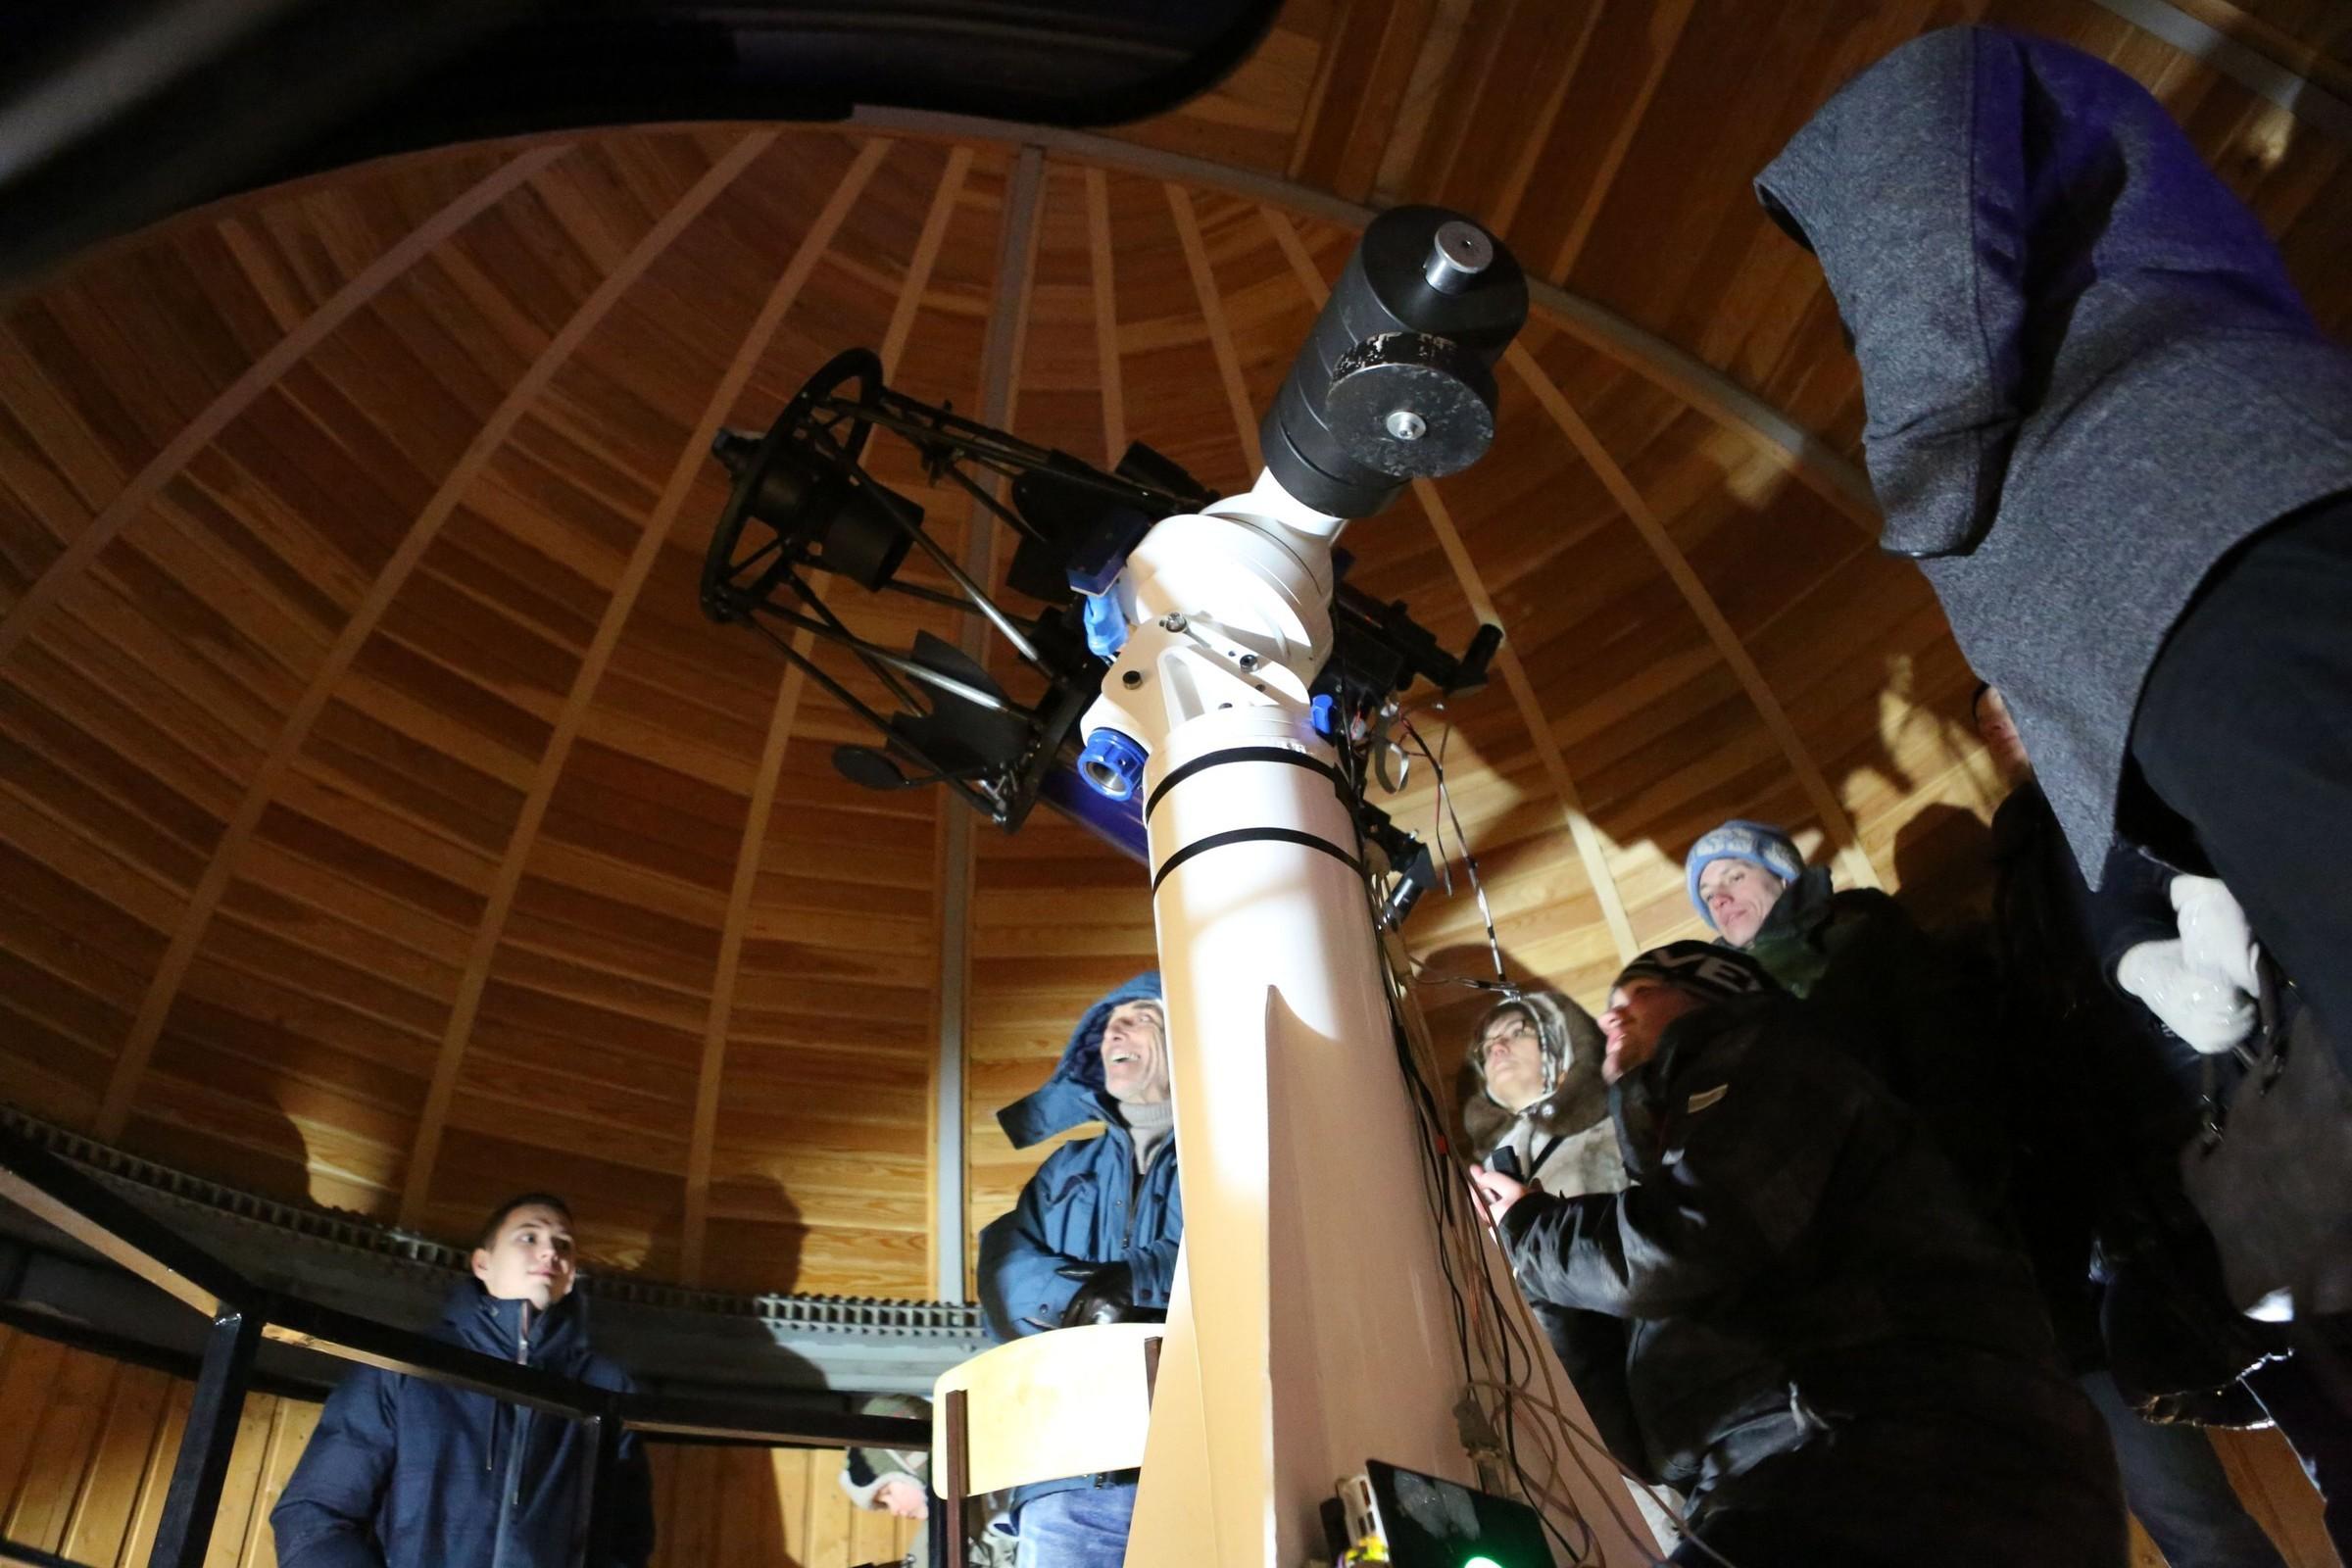 живучки картинки планетарий в новосибирске ваши дети